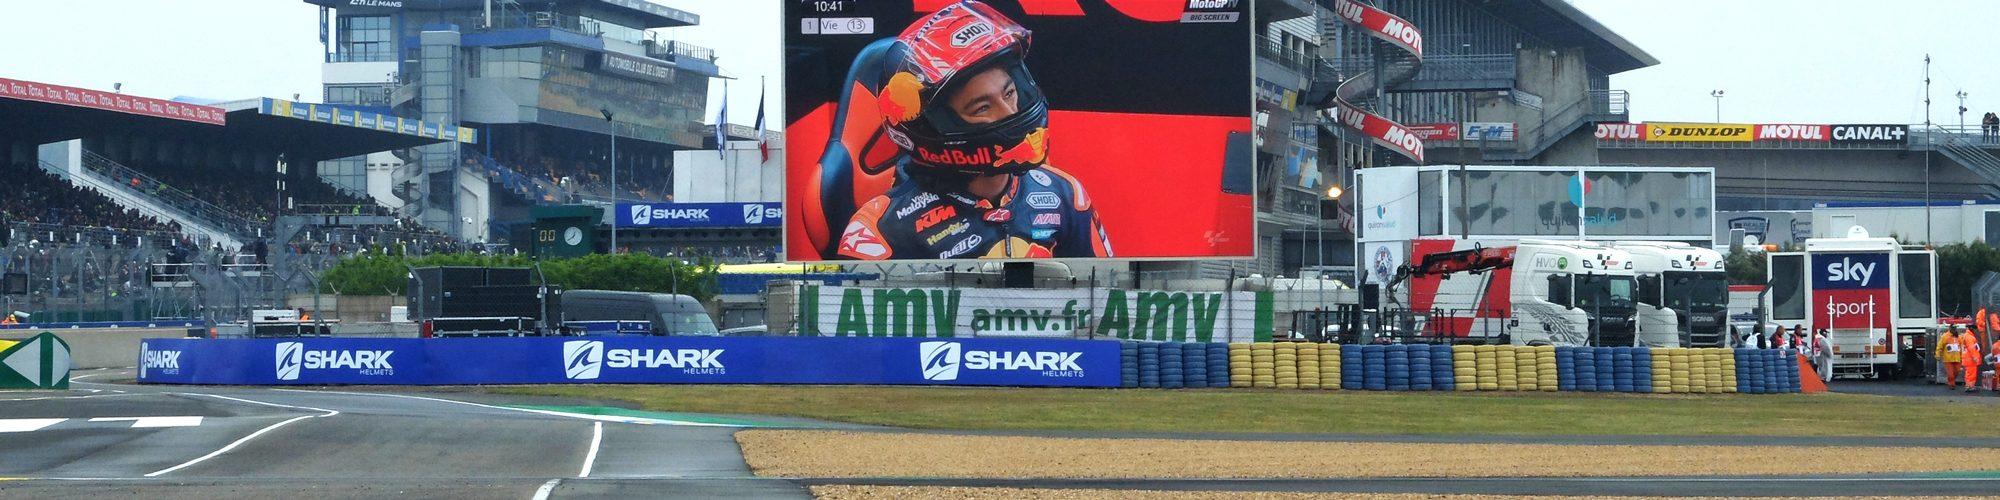 ecran-video-led-supervision-grand-prix-moto